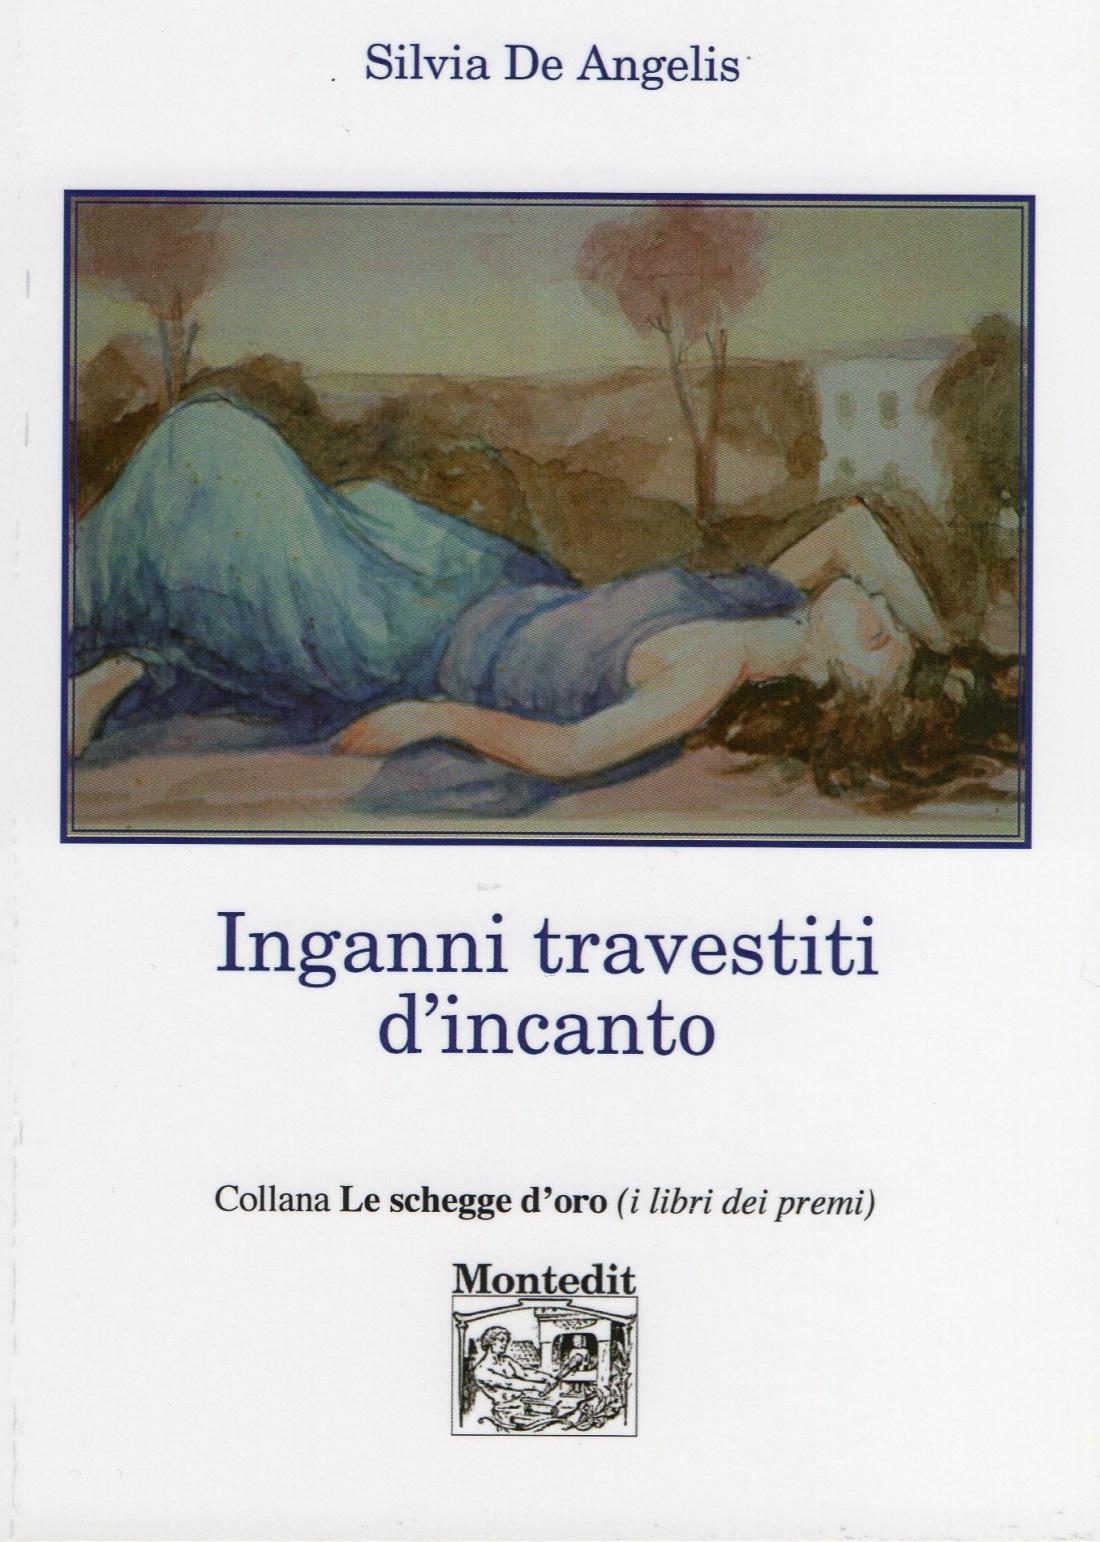 Inganni travestiti d'incanto di Silvia De Angelis.jpg